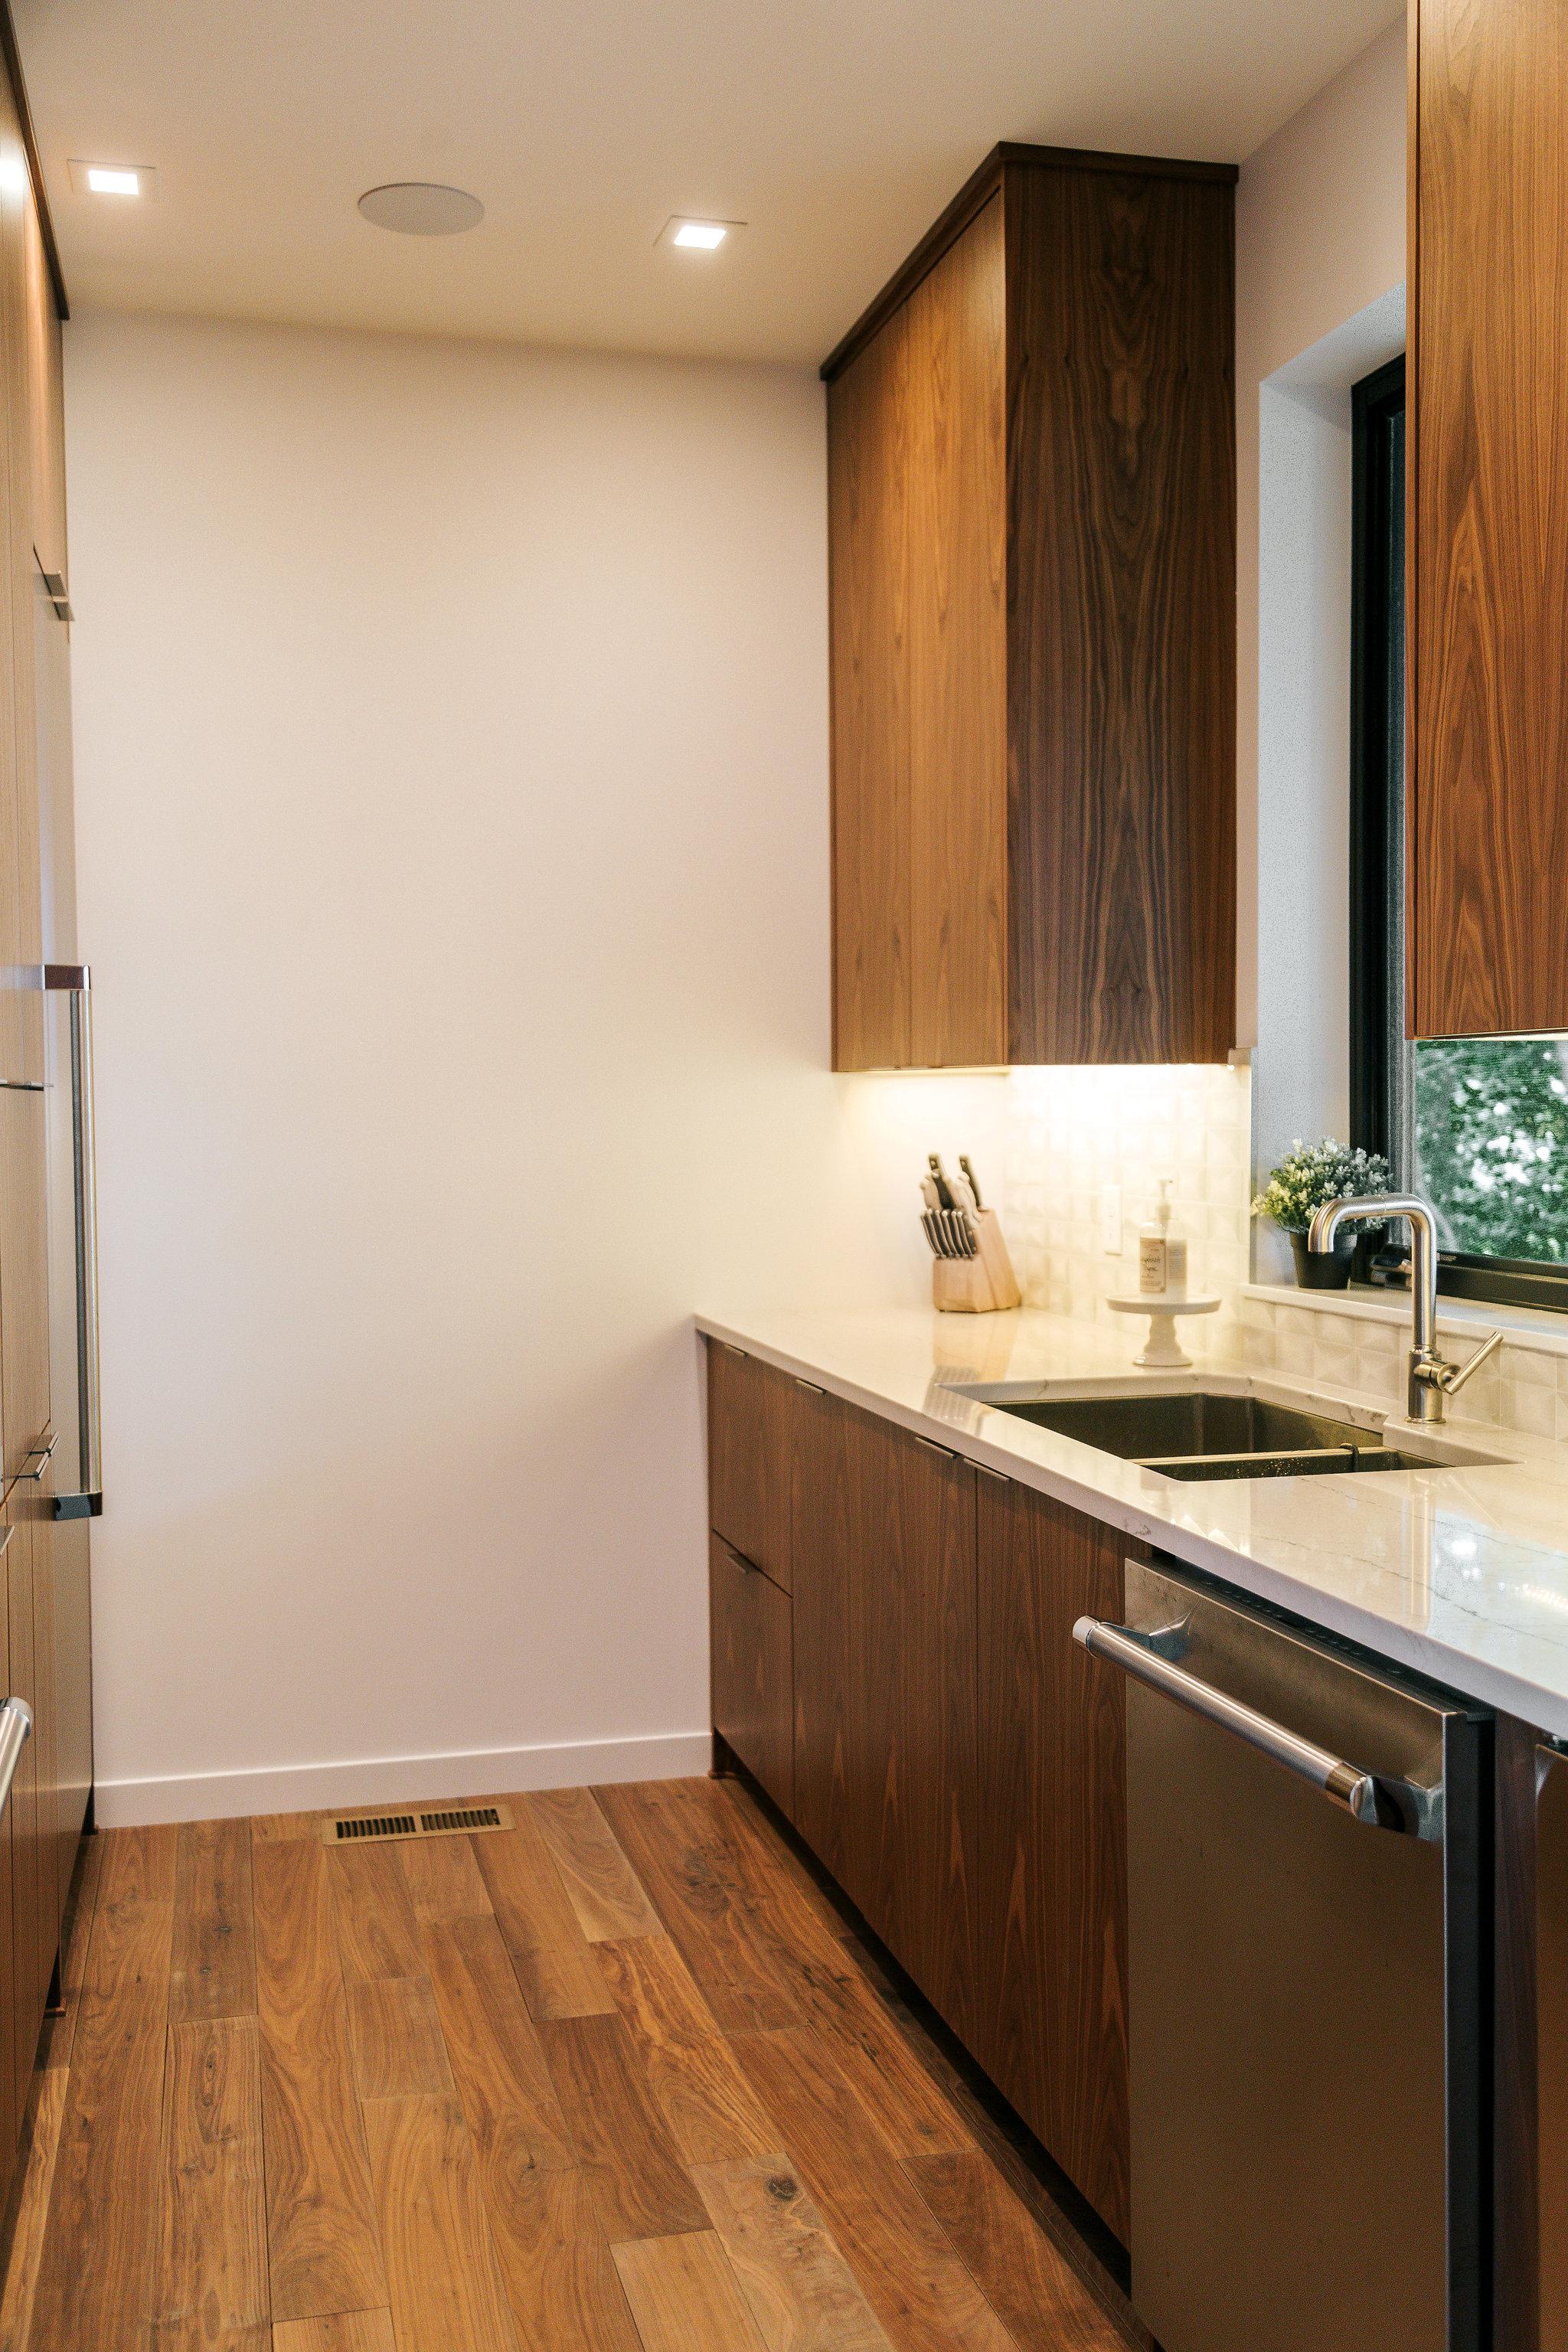 Merveilleux Frameless Vertical Grain Walnut Kitchen With Quartz Countertop And  Undermount Sink.